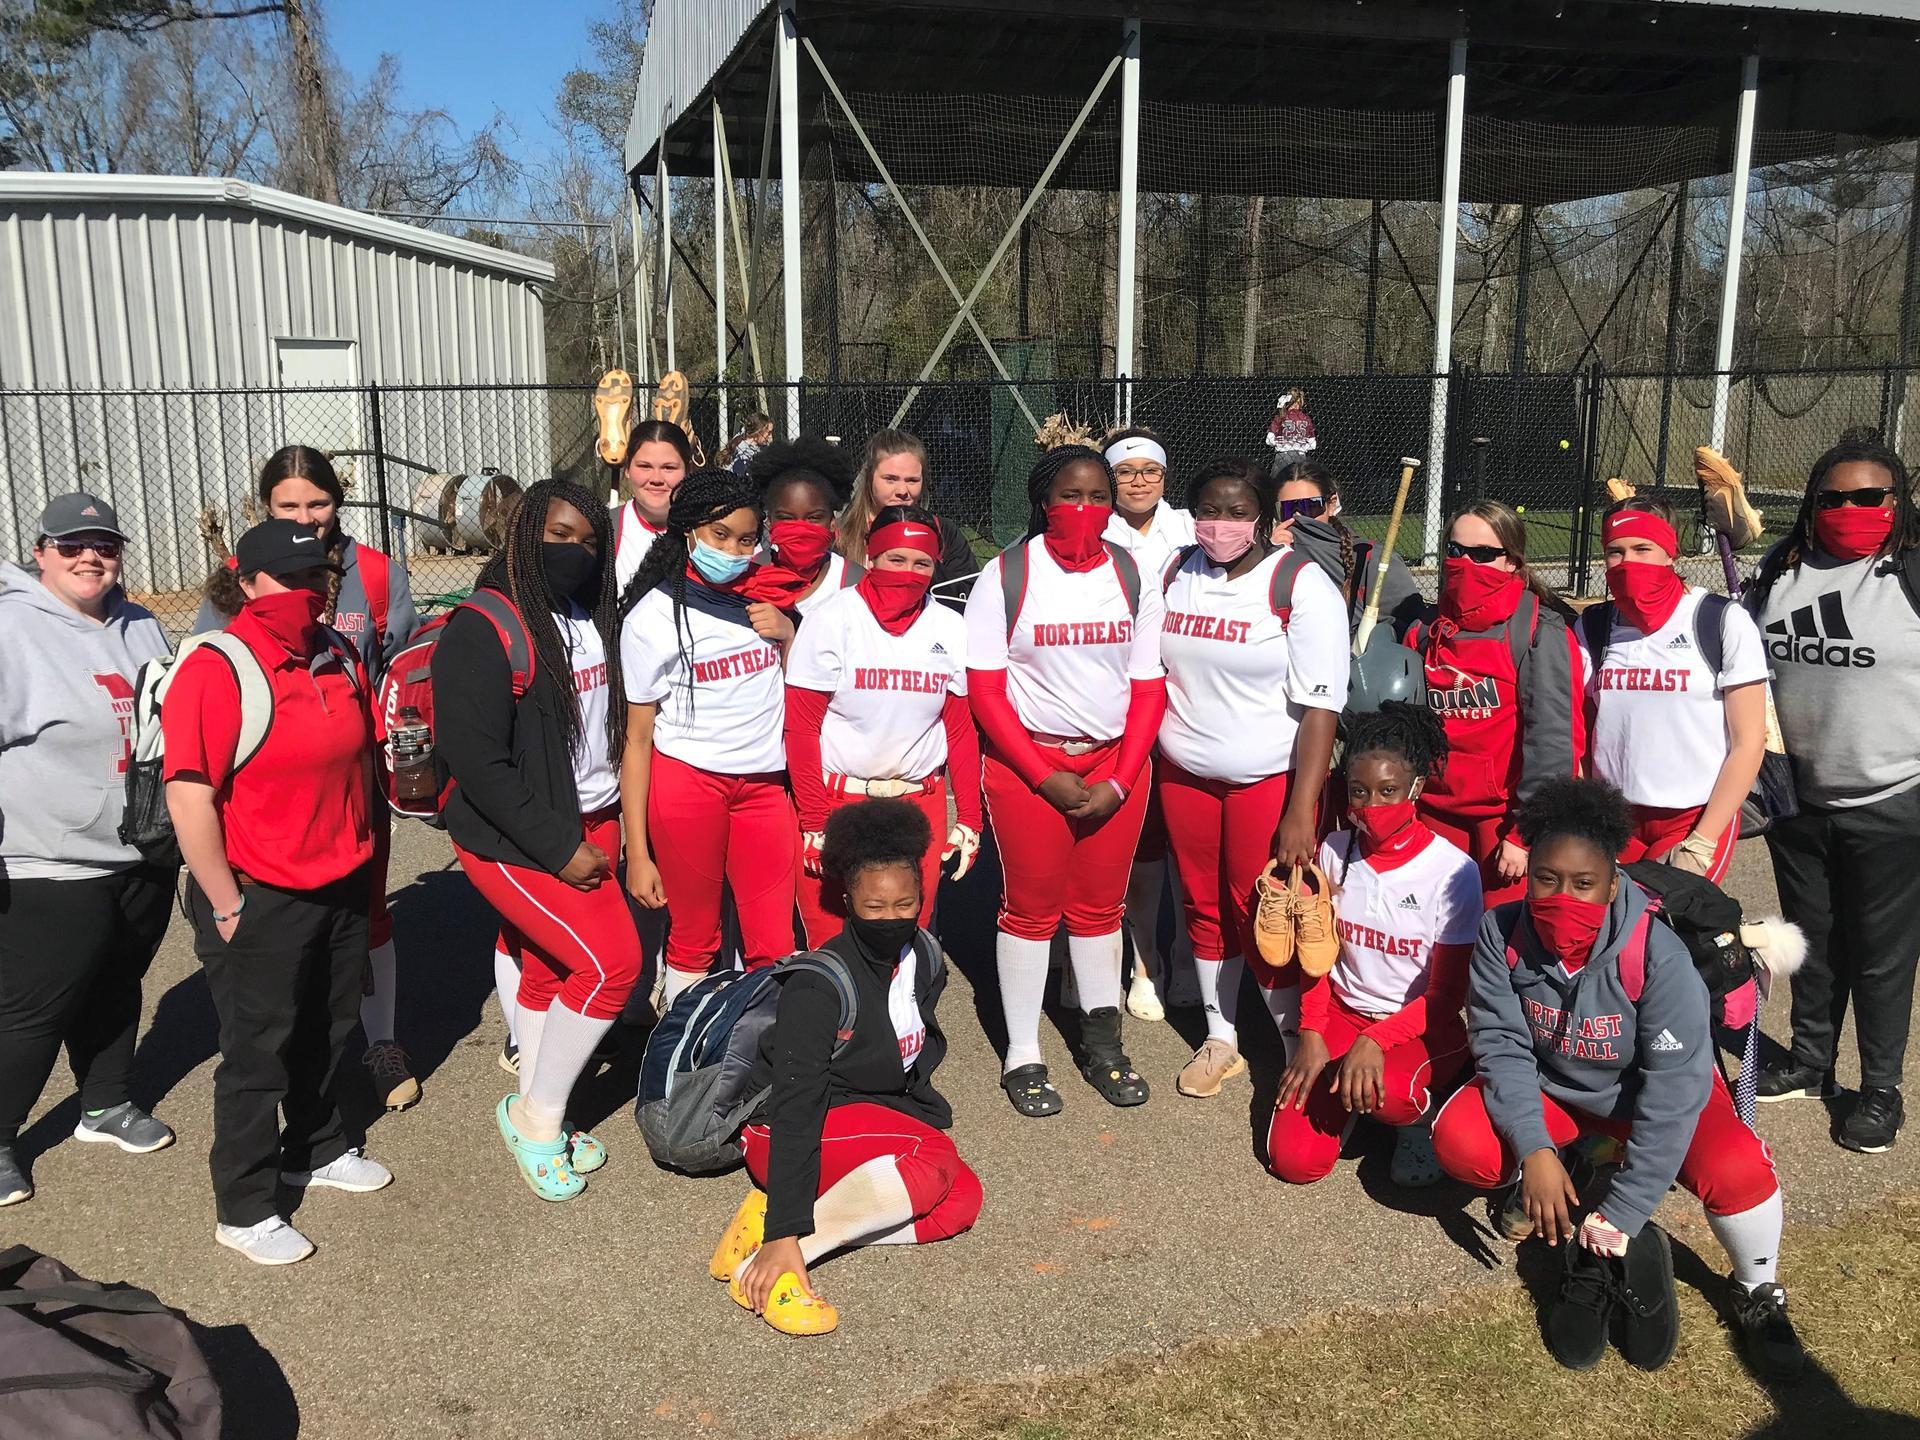 NEHS Softball Team